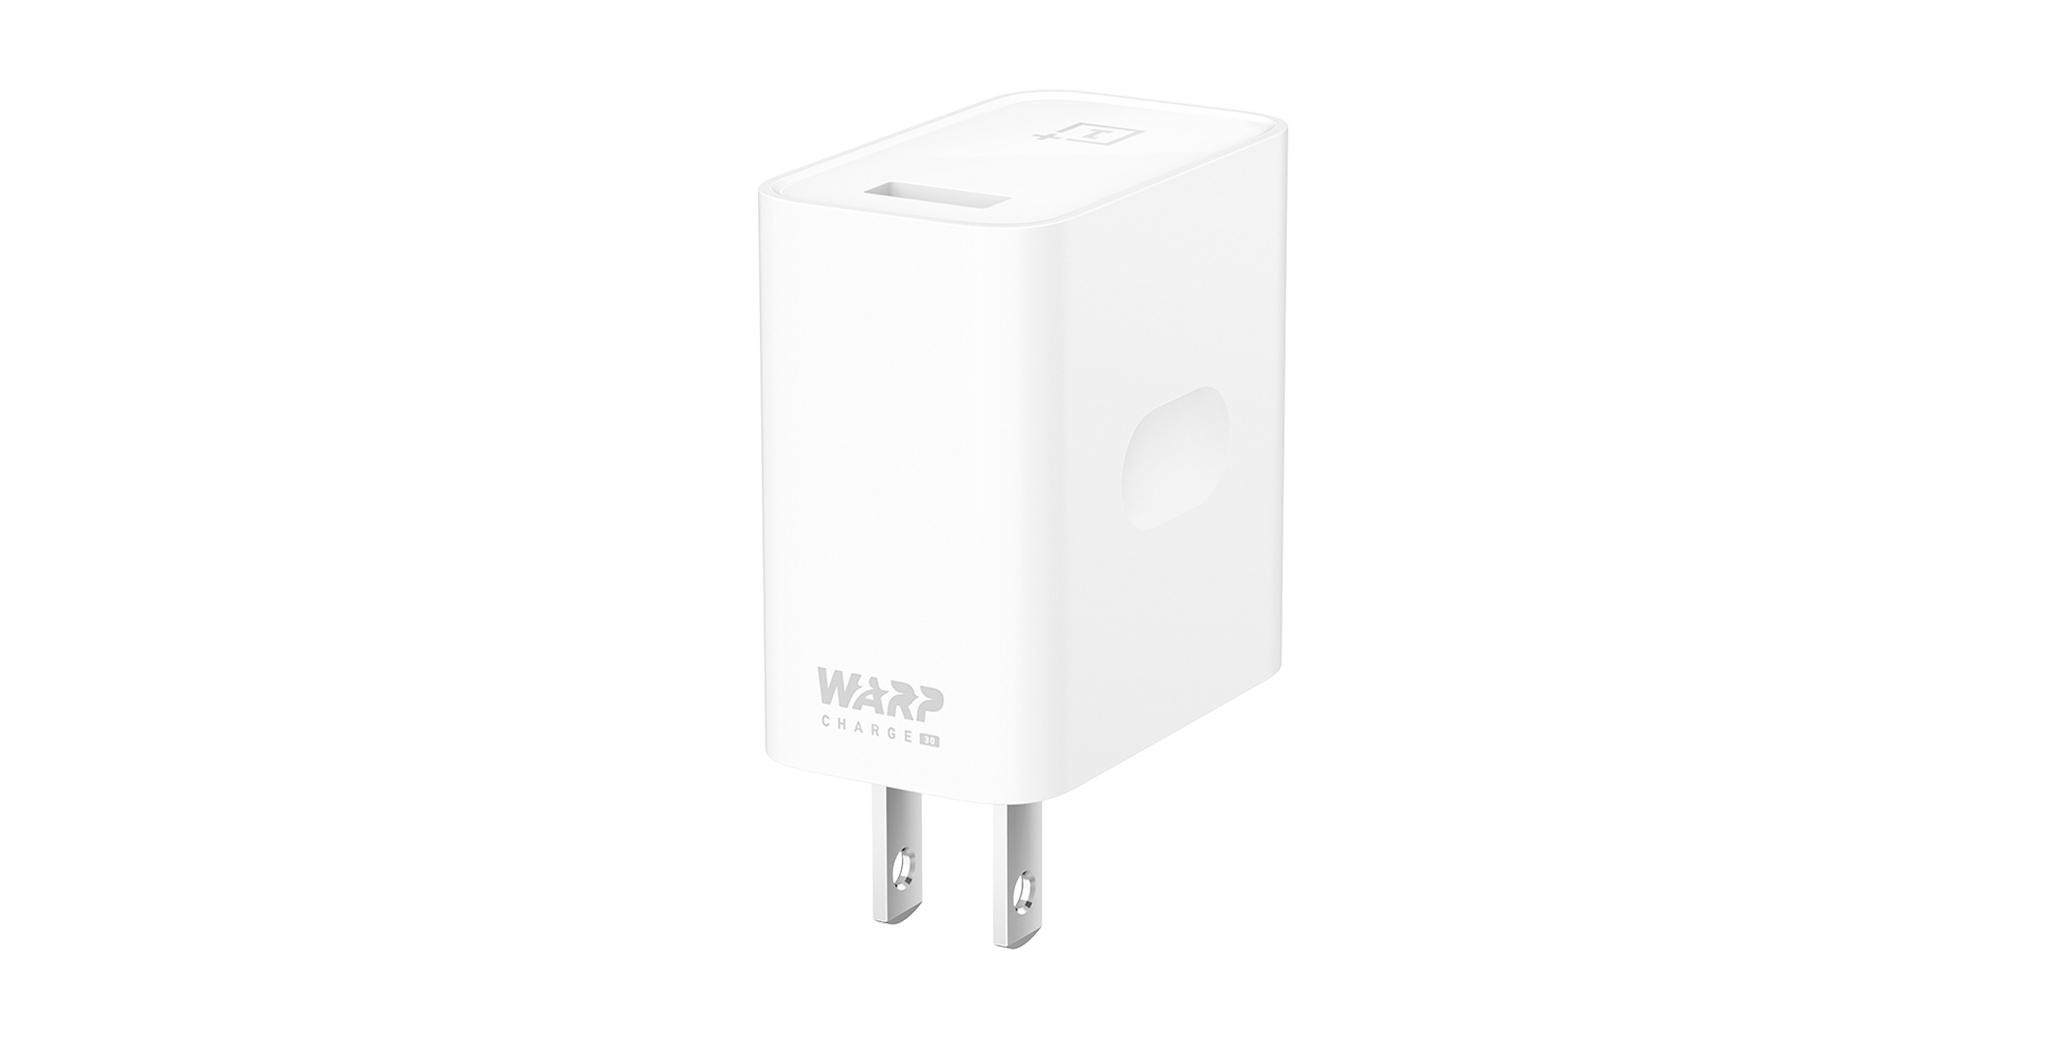 warp-charge-oneplus-bo-sac-cap-cho-oneplus-7-7pro-7t-7t-pro